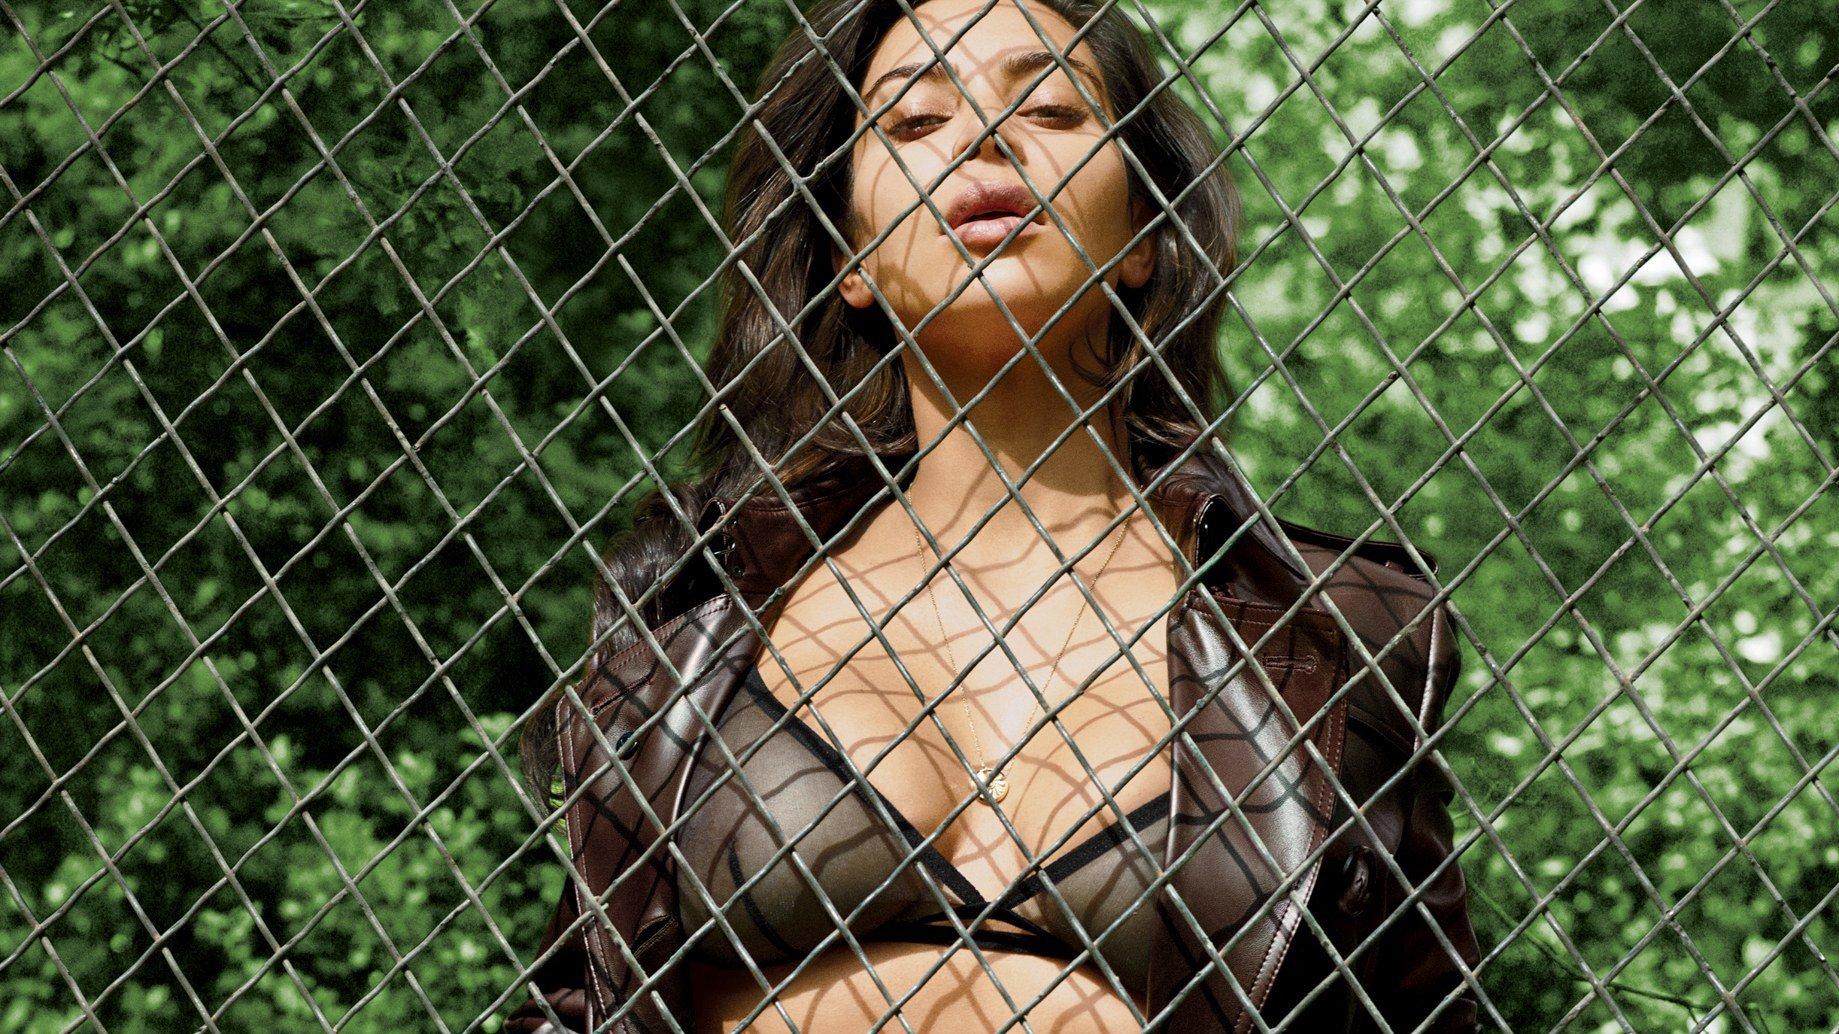 Kim Kardashian Gq Photoshoot - Kim Kardashian Phenomenal Star